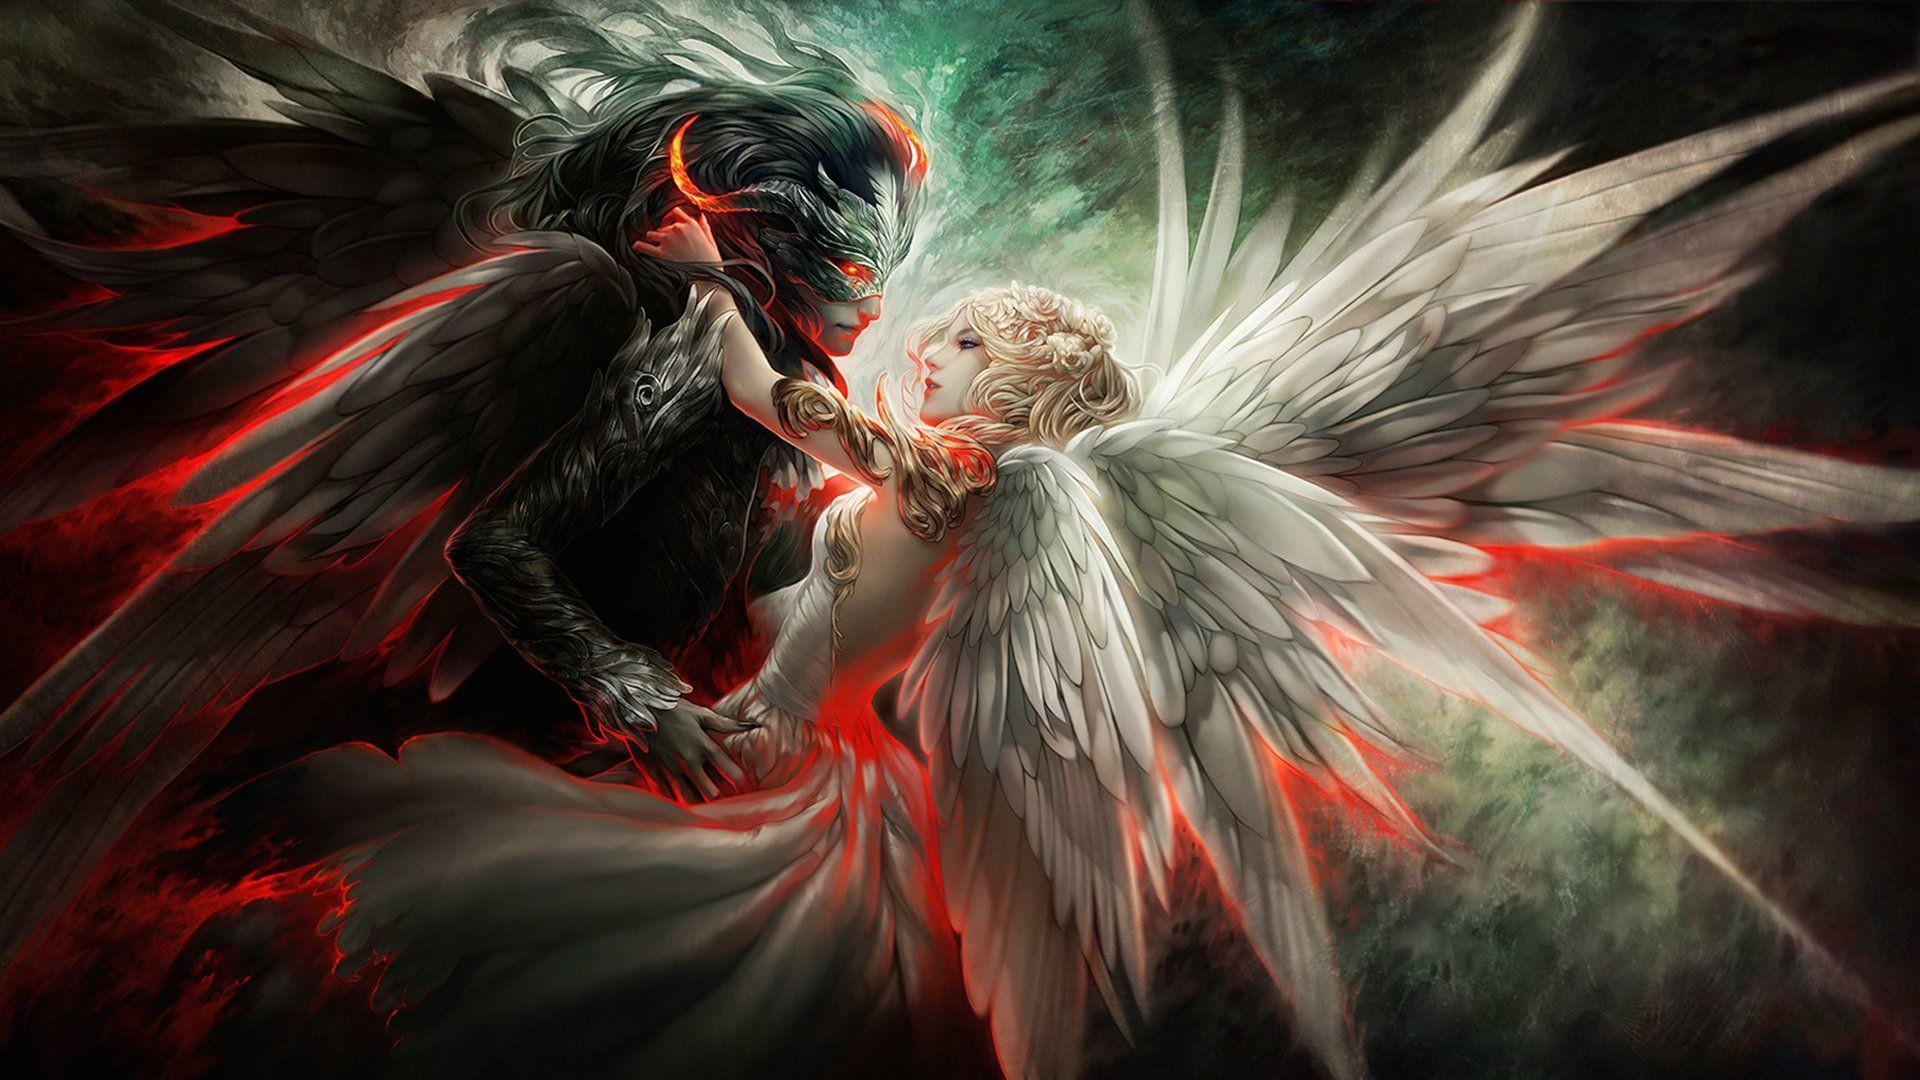 Black Clover Asta Demon Wallpaper Hd